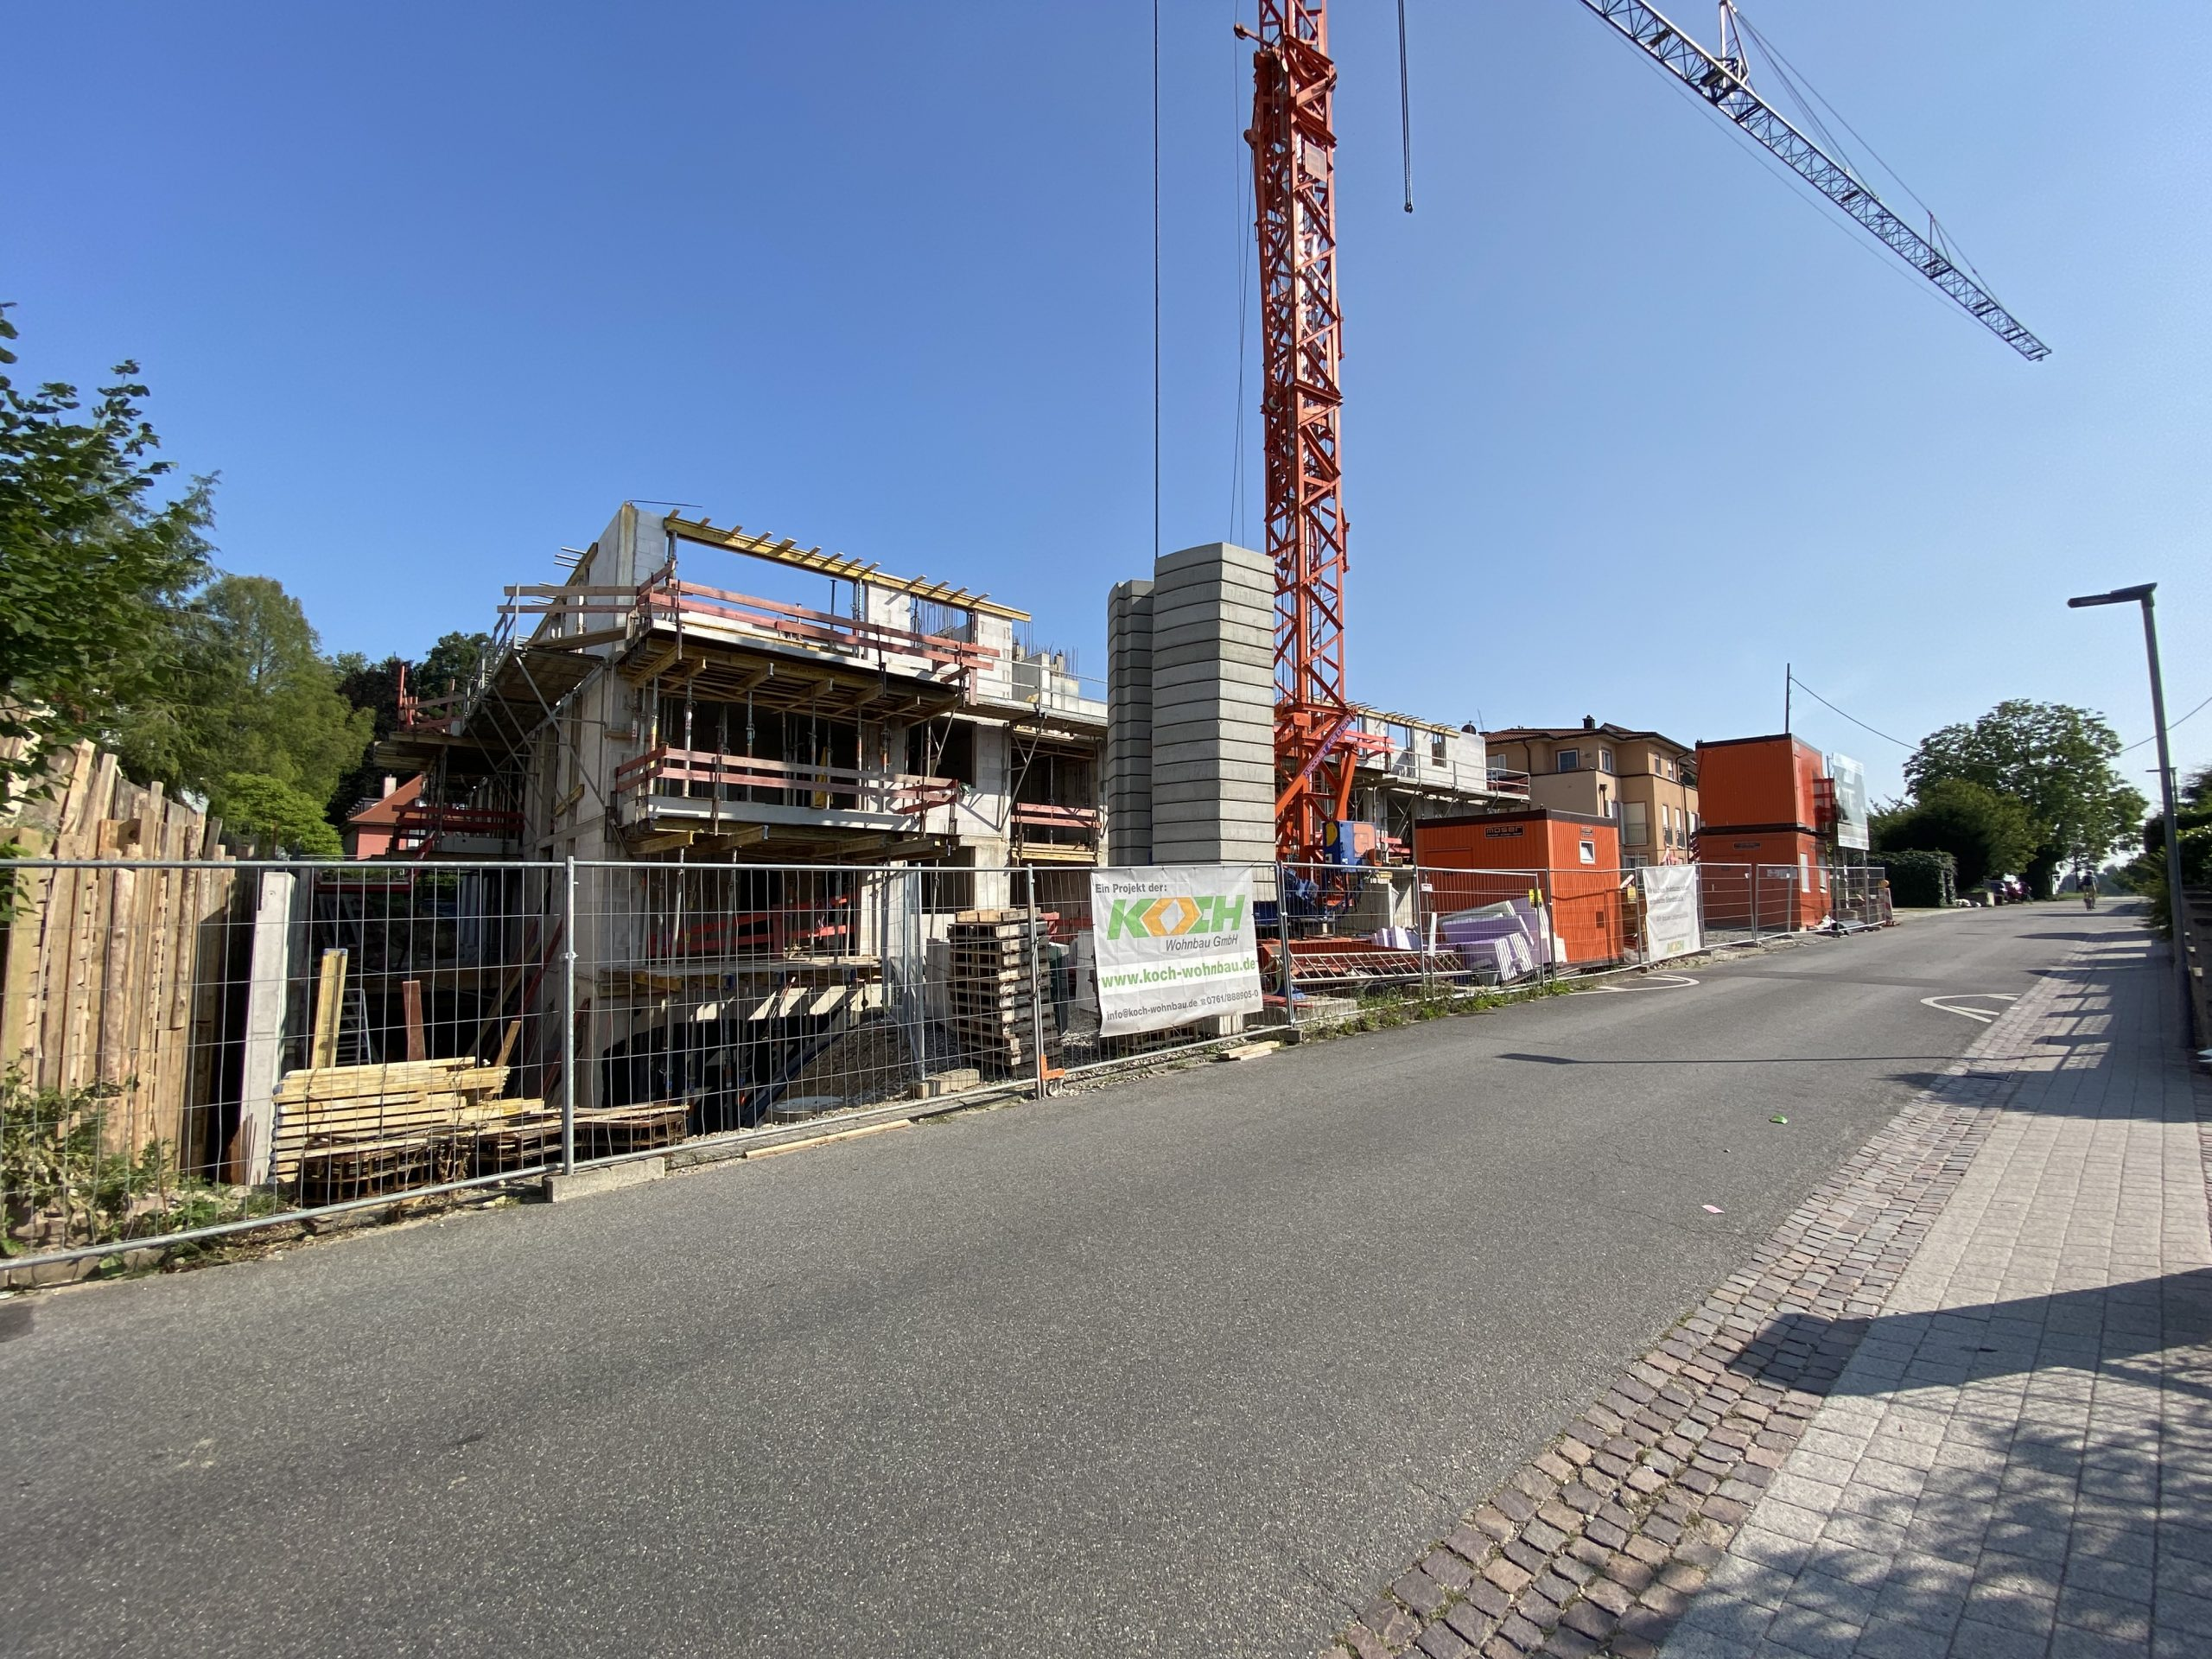 Baustelle Bad Krozingen 21.07.2021